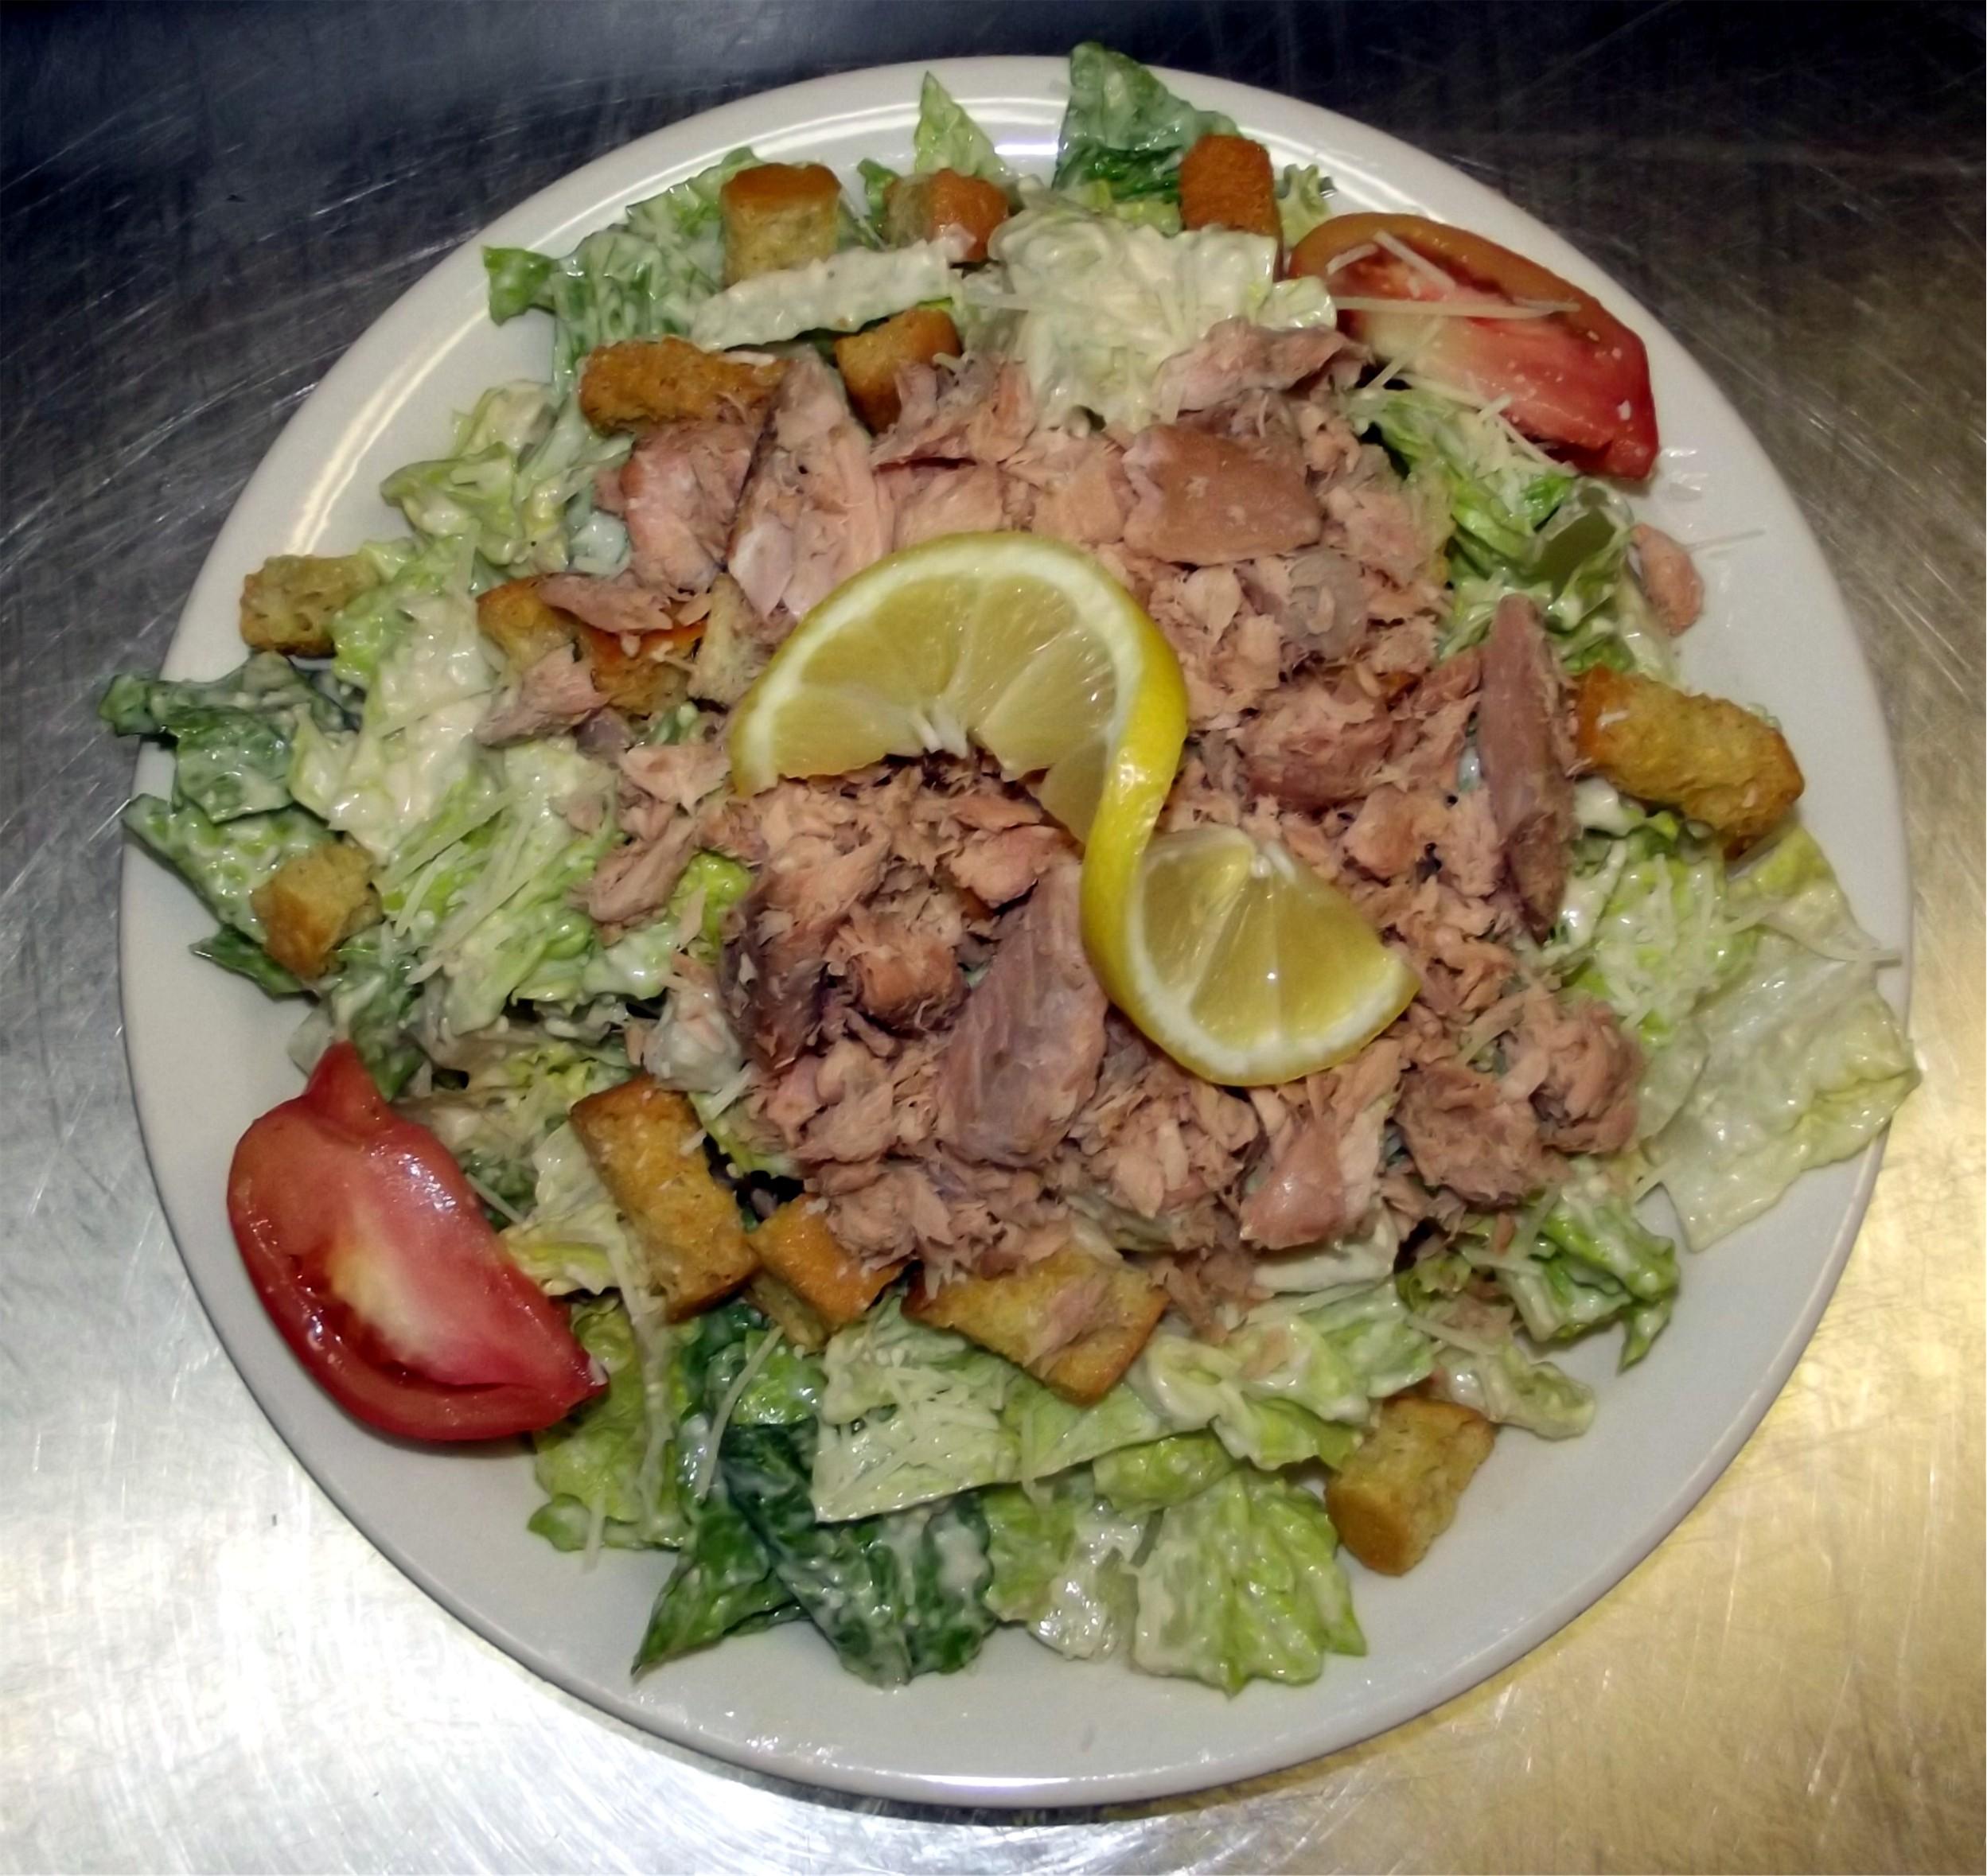 Caesar Salad topped with Smoked Salmon